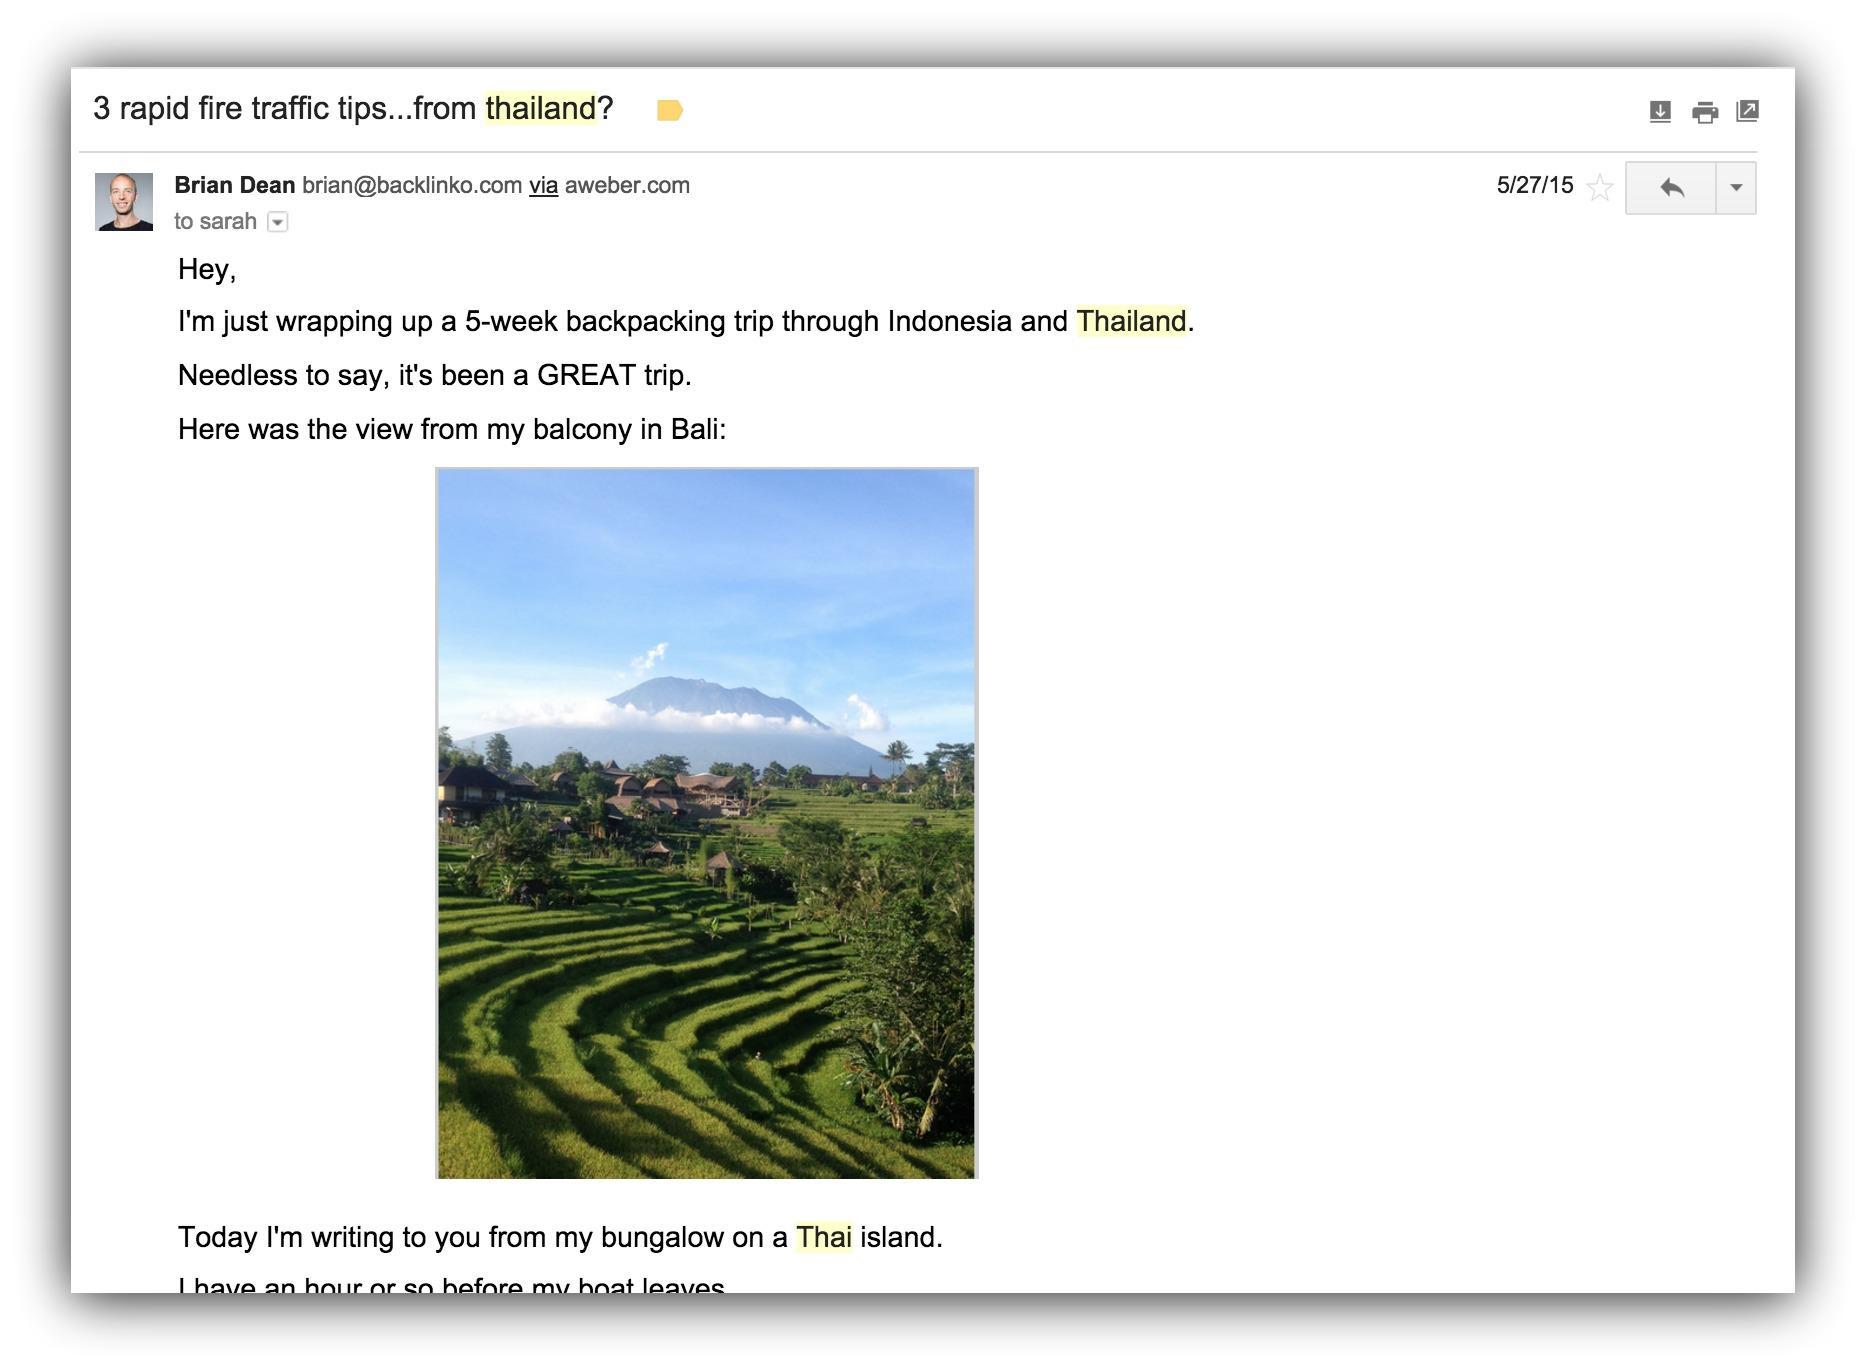 Screenshot of a n email sent by Brian Dean of backlinko.com